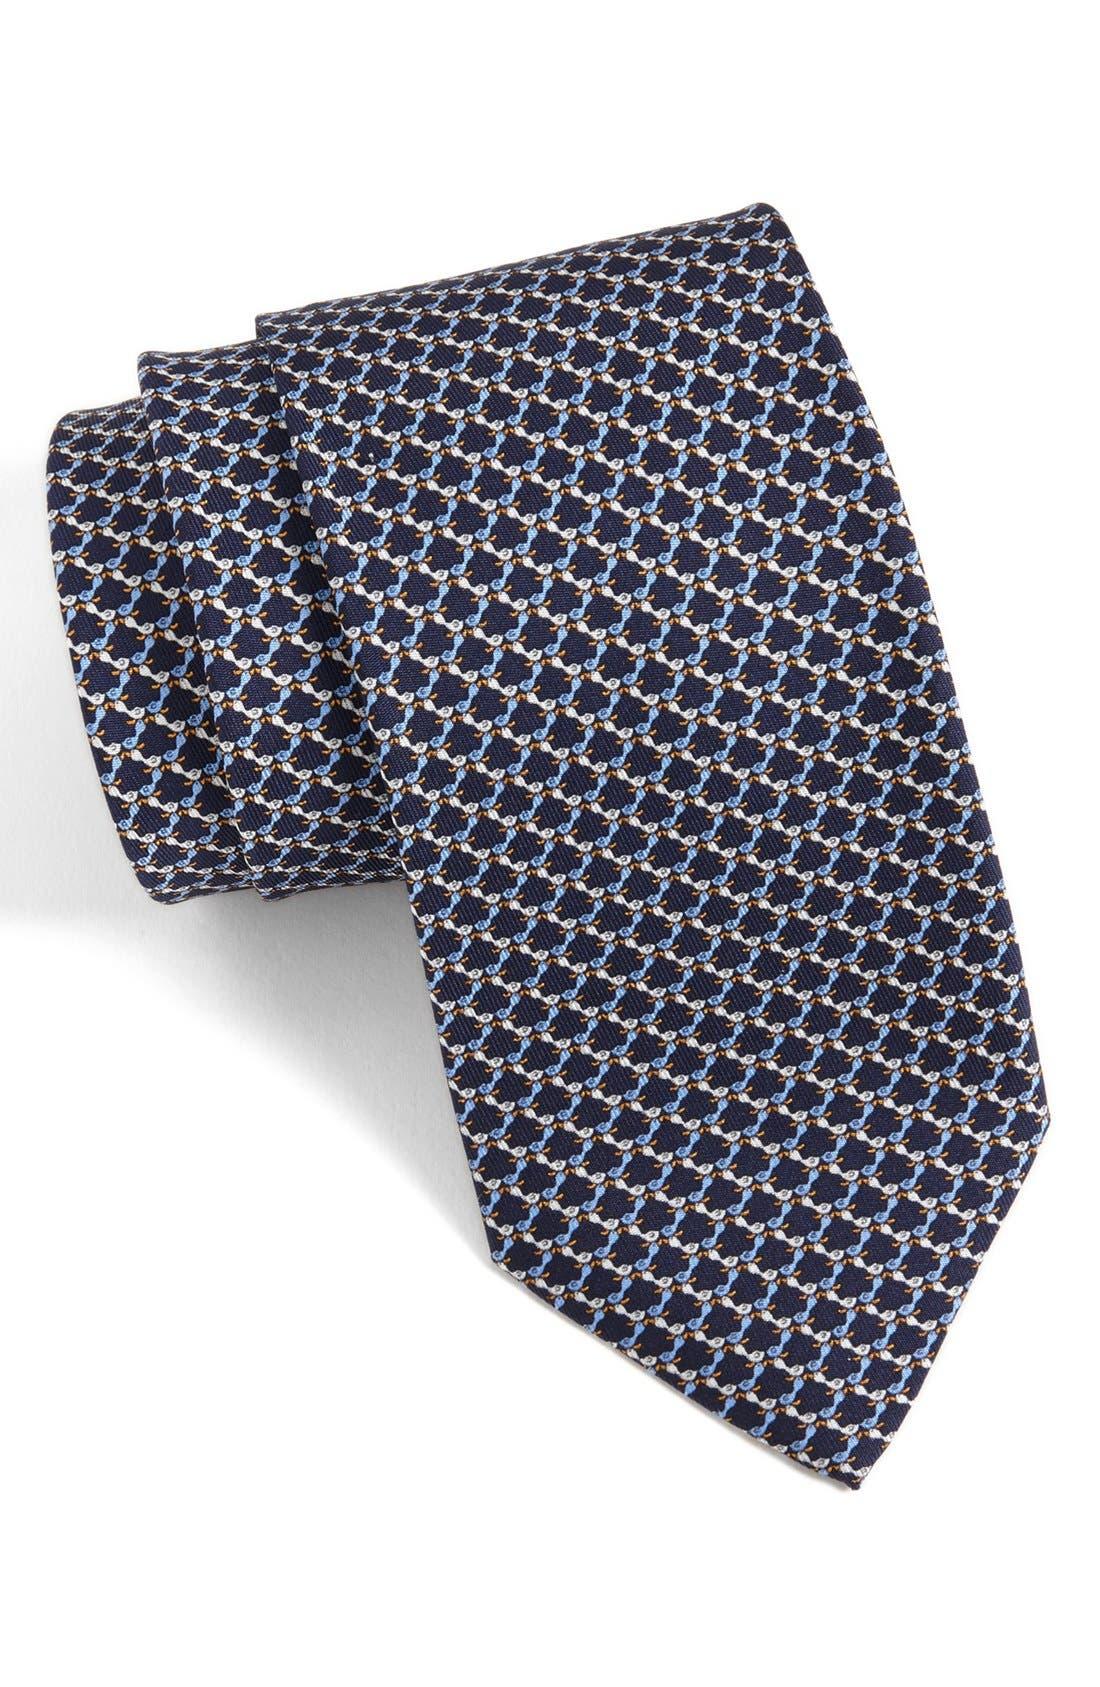 Alternate Image 1 Selected - Salvatore Ferragamo Bird Motif Silk Tie